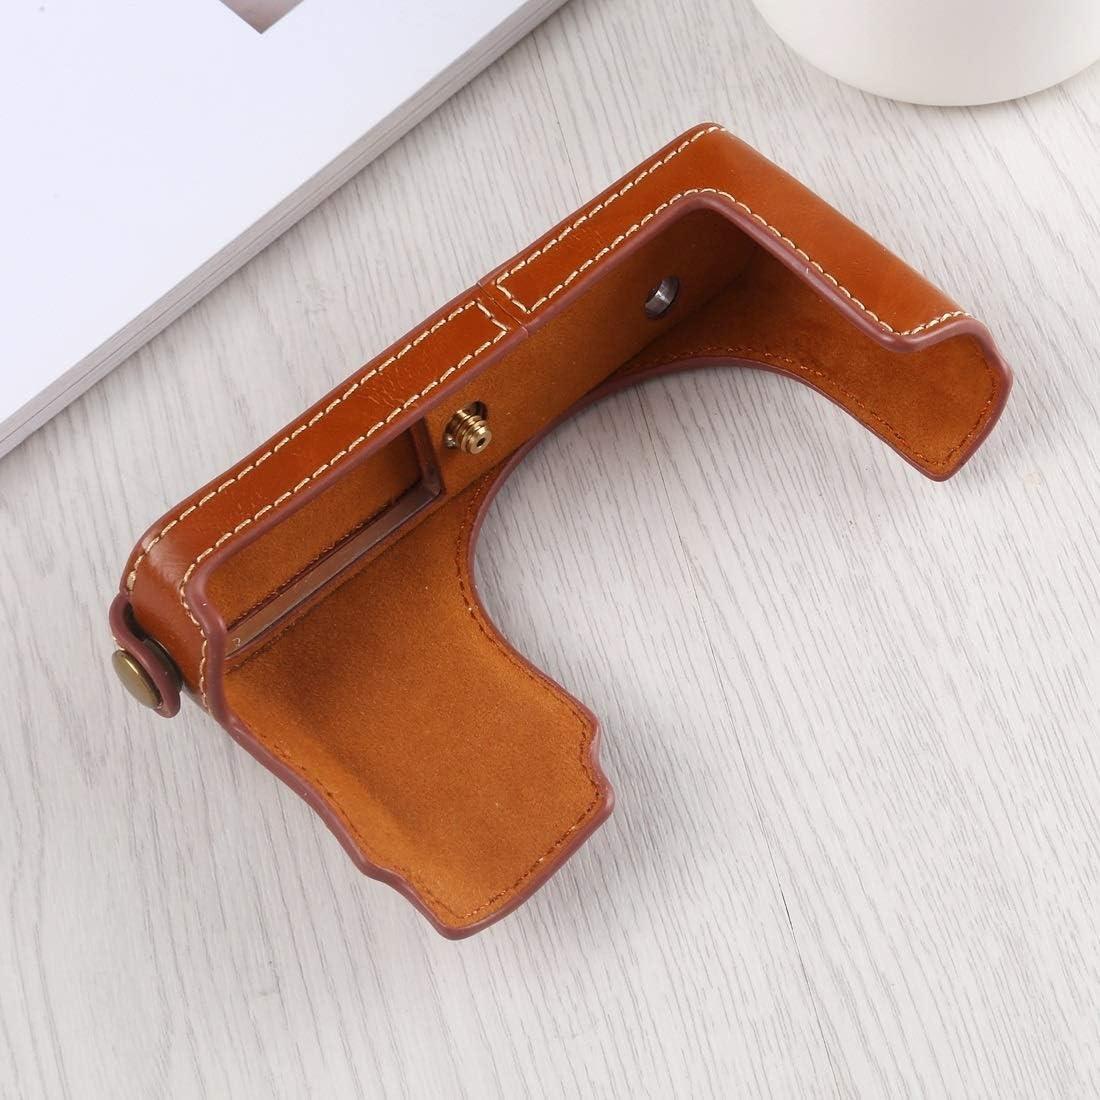 Ychaoya High-end Camera Case Wuzpx 1//4 inch Thread PU Leather Camera Half Case Cornerstone for Leica DLUX TYP 109 Black Color : Brown